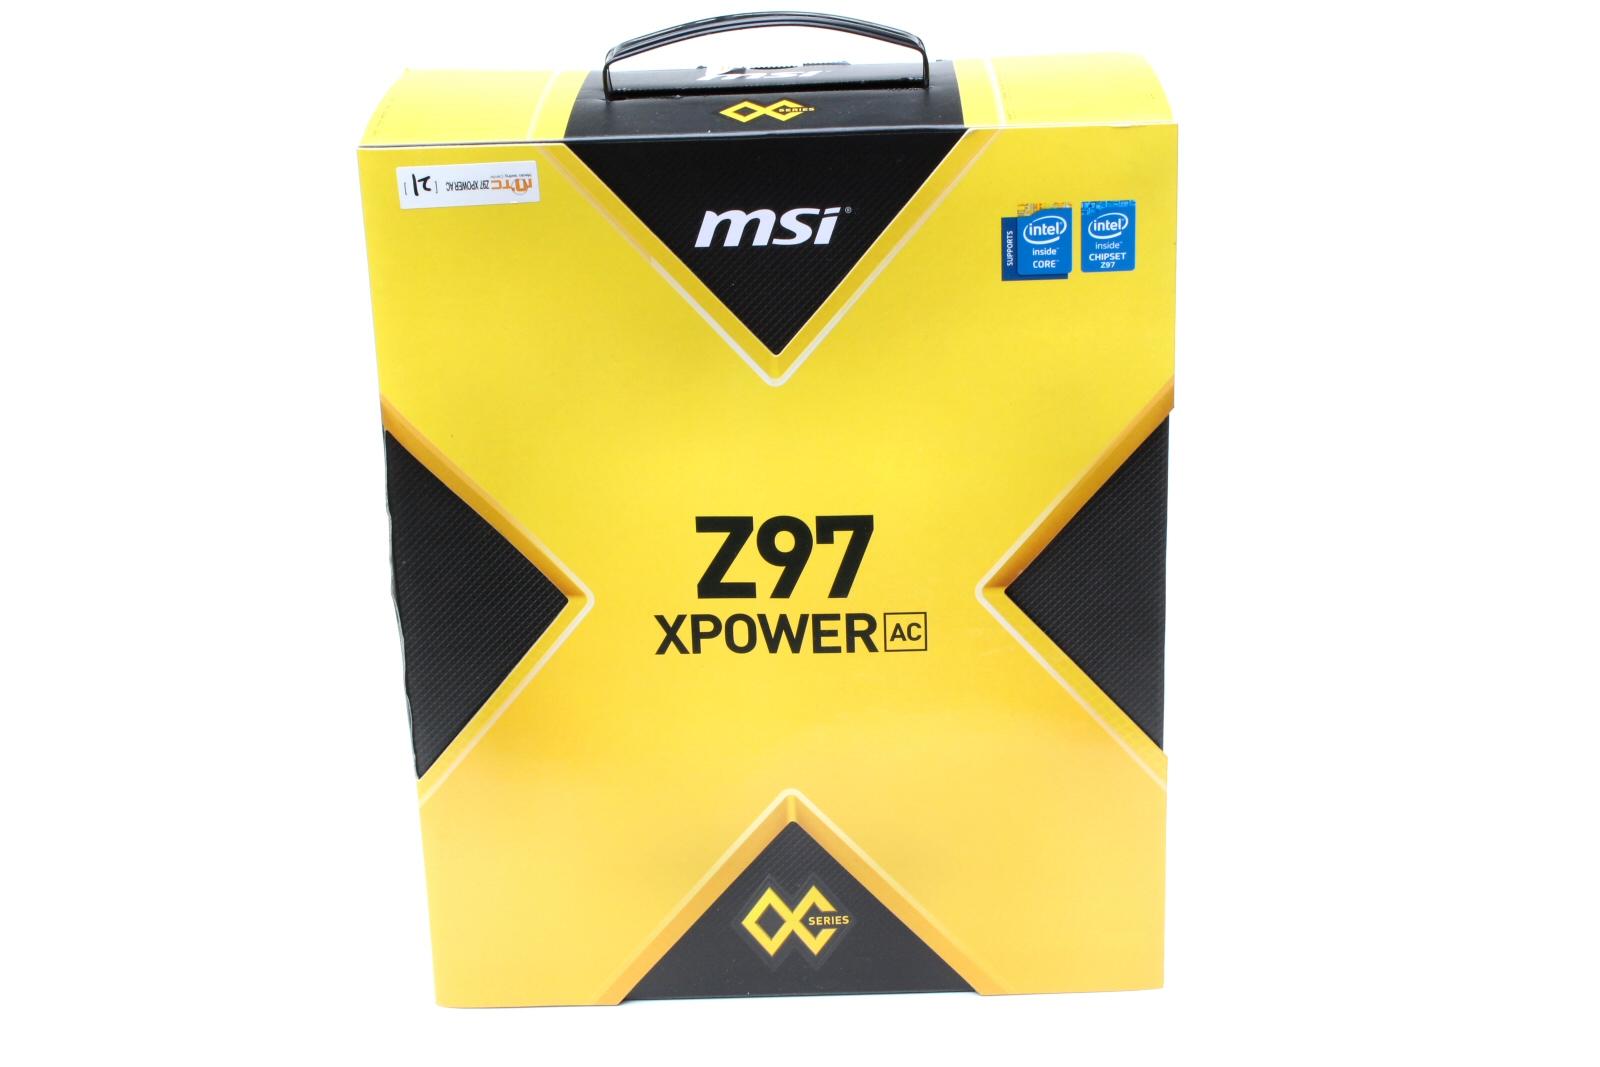 [Review] MSI Z97 XPower AC-img_5243.jpg